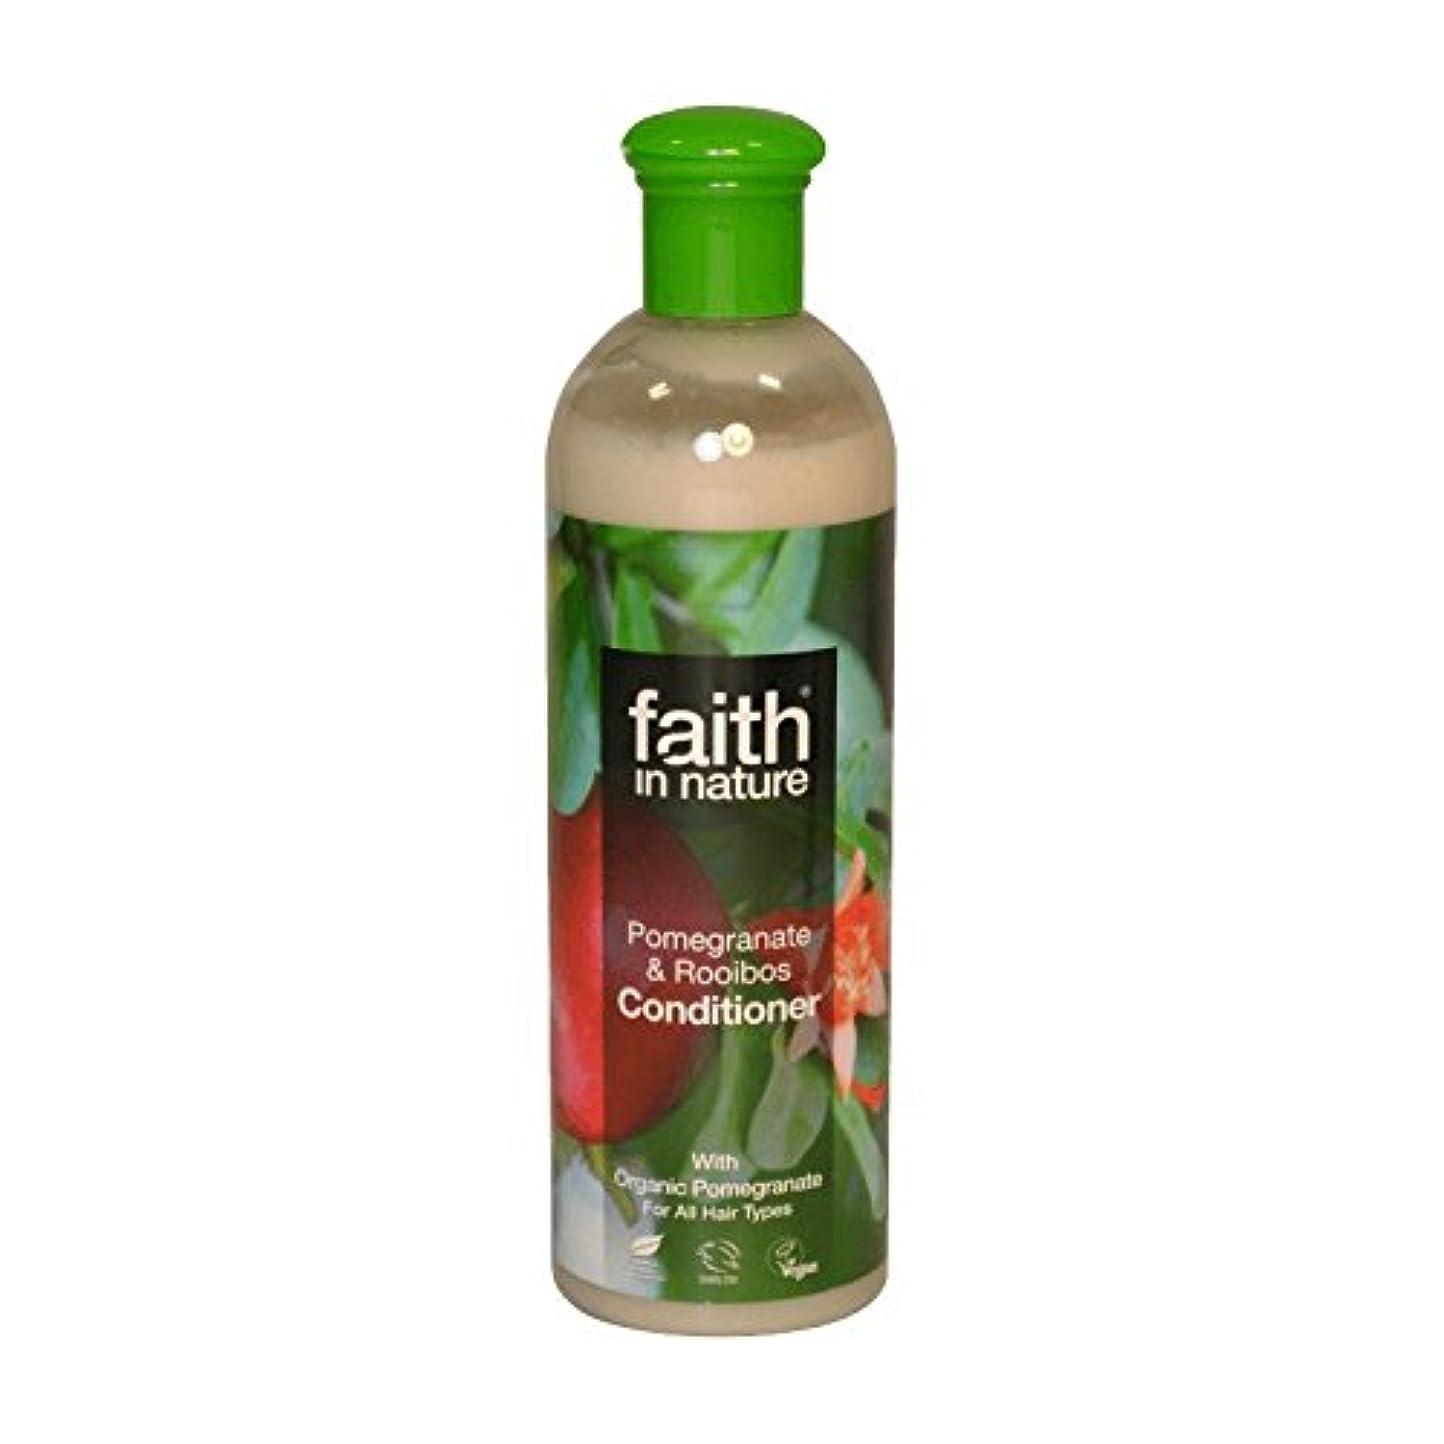 Faith in Nature Pomegranate & Roobios Conditioner 400ml (Pack of 6) - 自然ザクロ&Roobiosコンディショナー400ミリリットルの信仰 (x6) [...